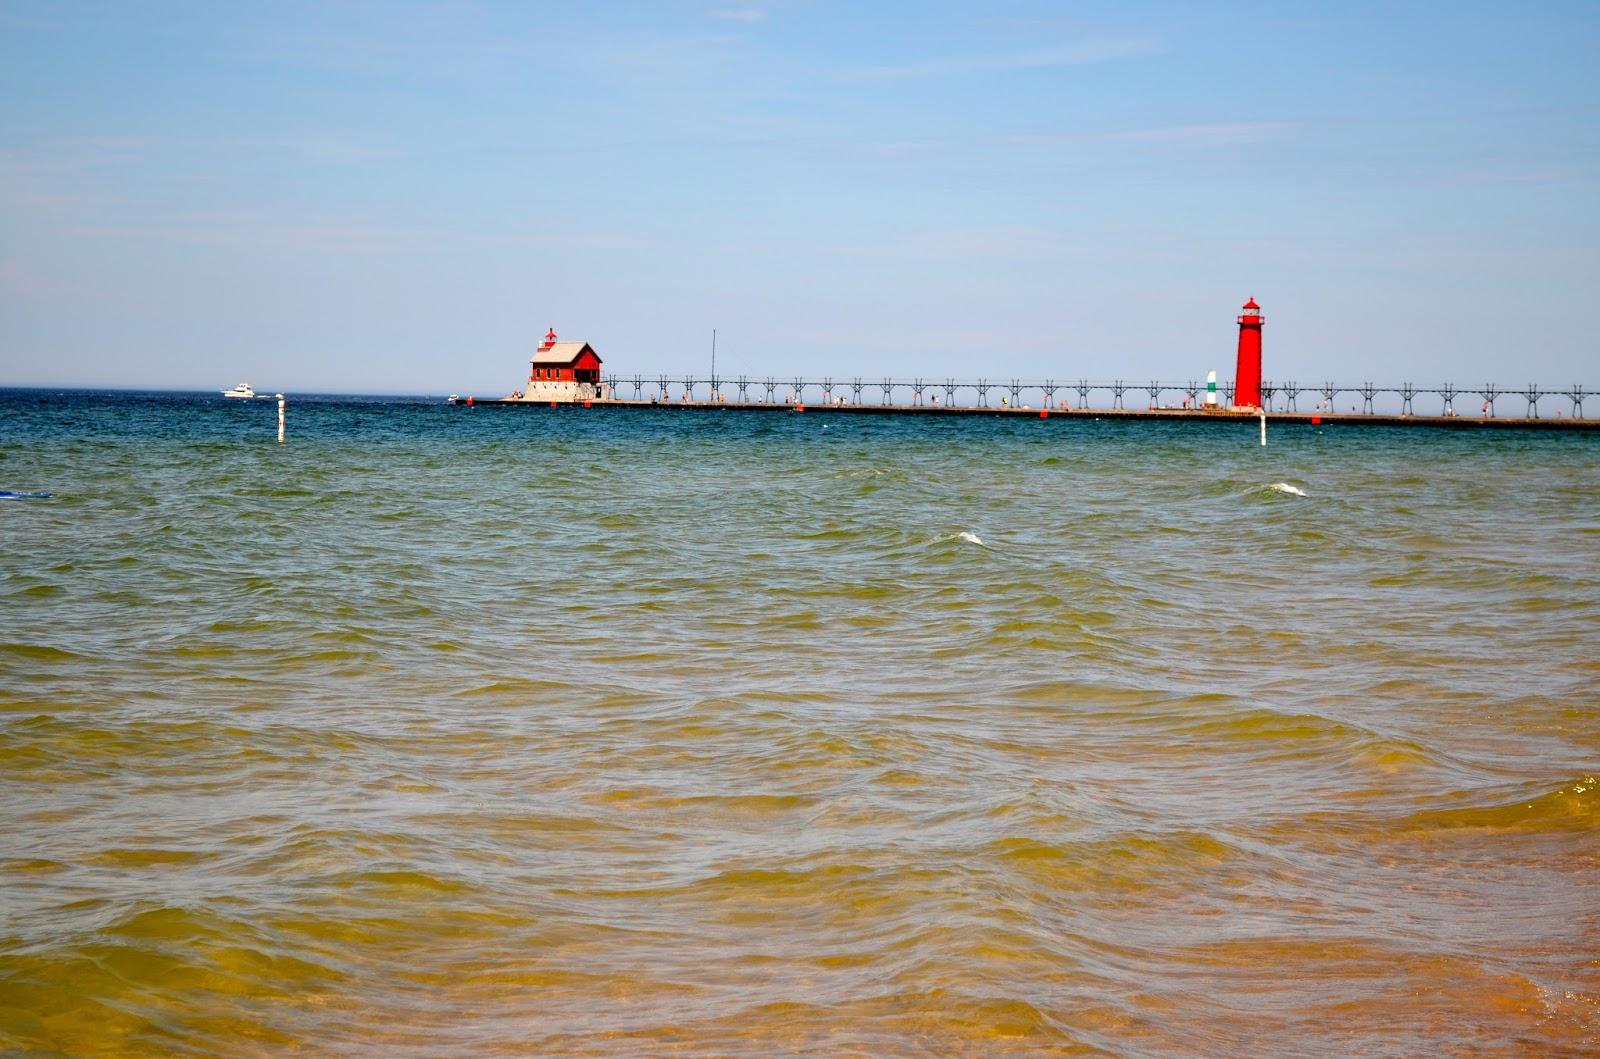 Summer on Lake Michigan